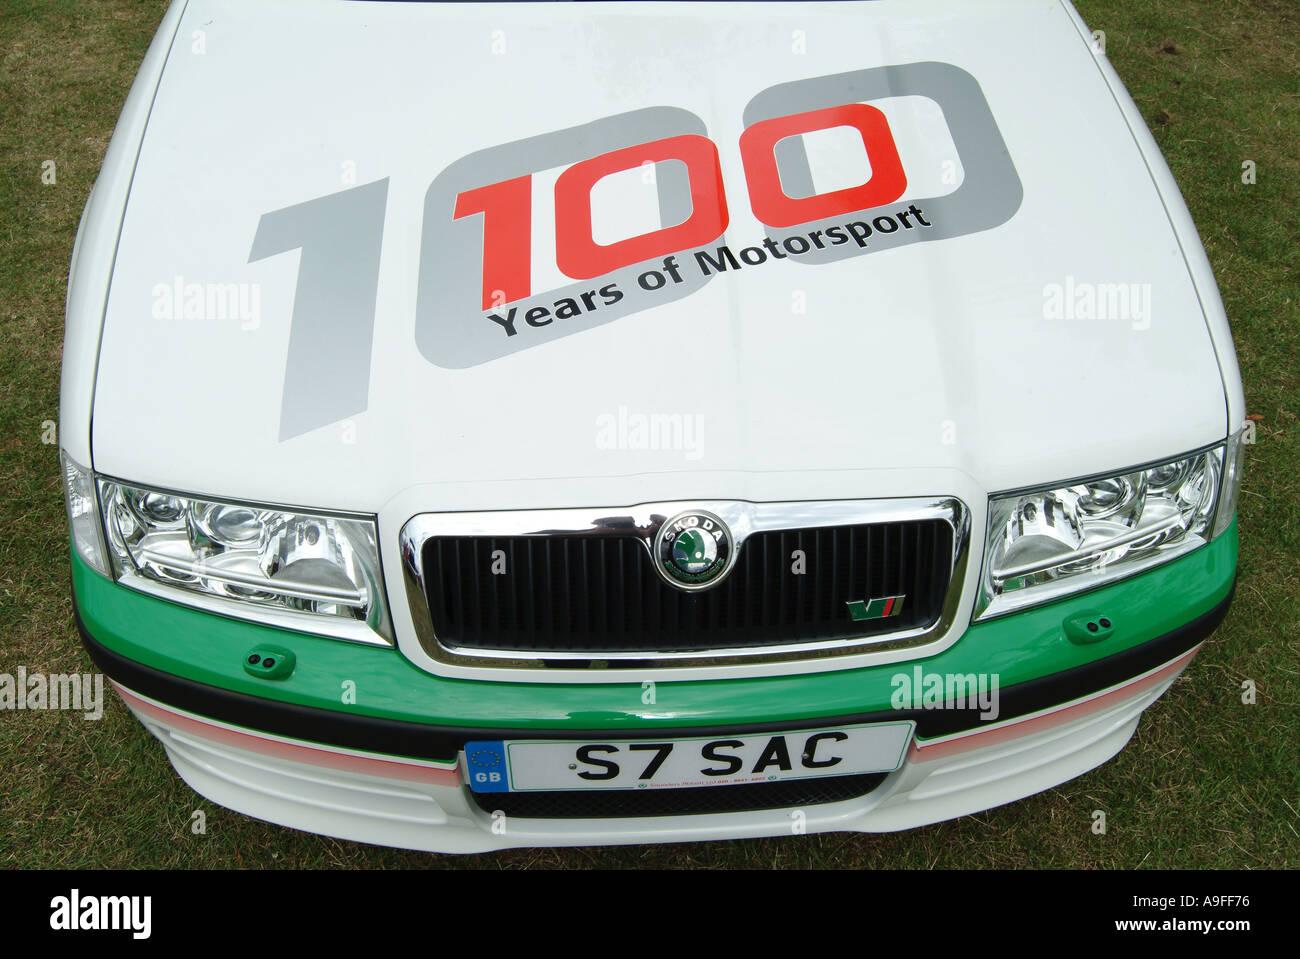 skoda vw 100 years fabia New car Finance dealer show 0 Car sale car ...